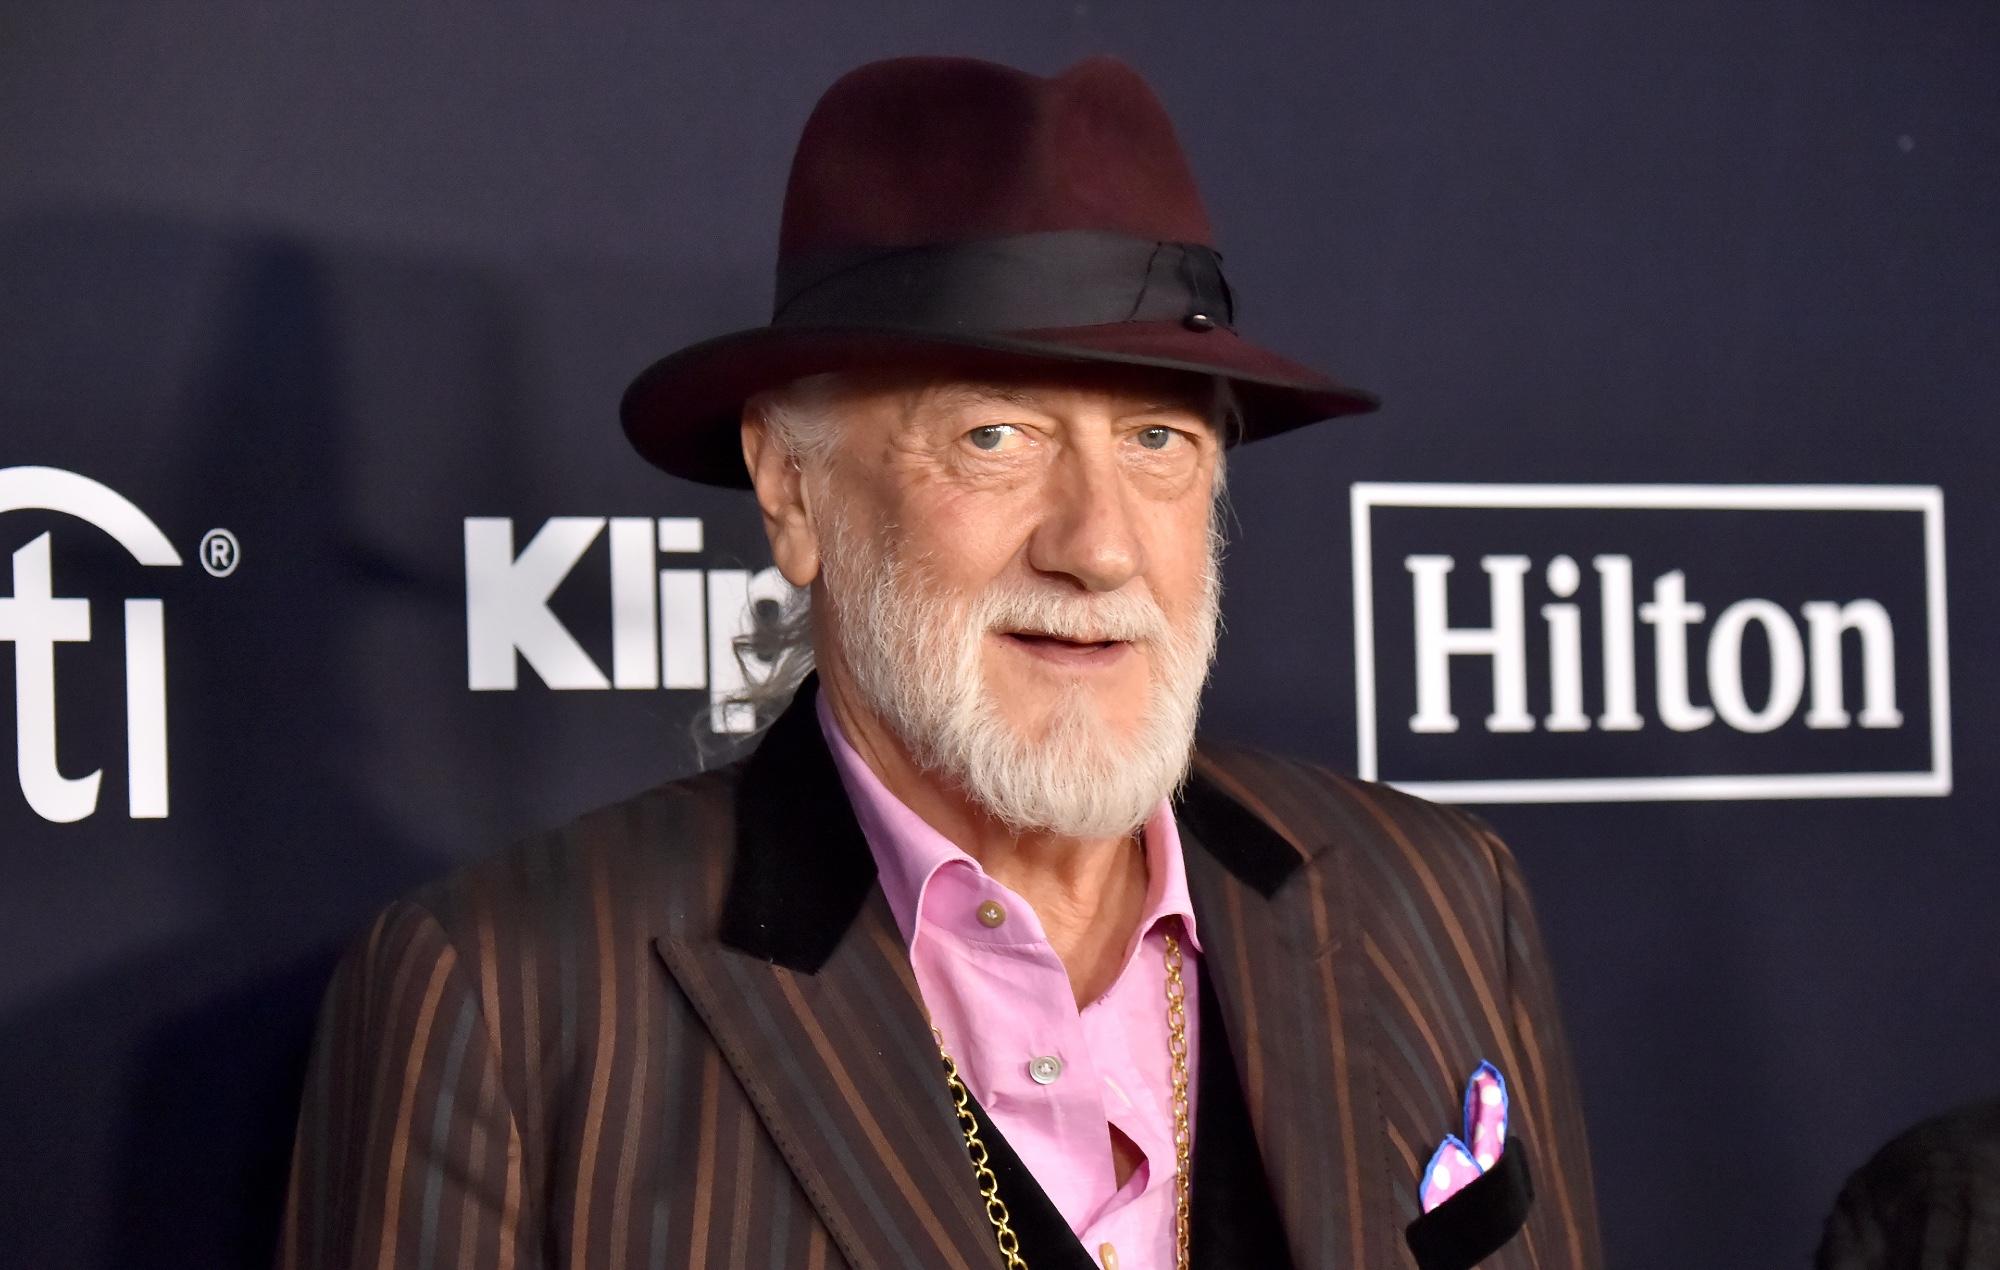 Mick Fleetwood sells his share in Fleetwood Mac royalties 2